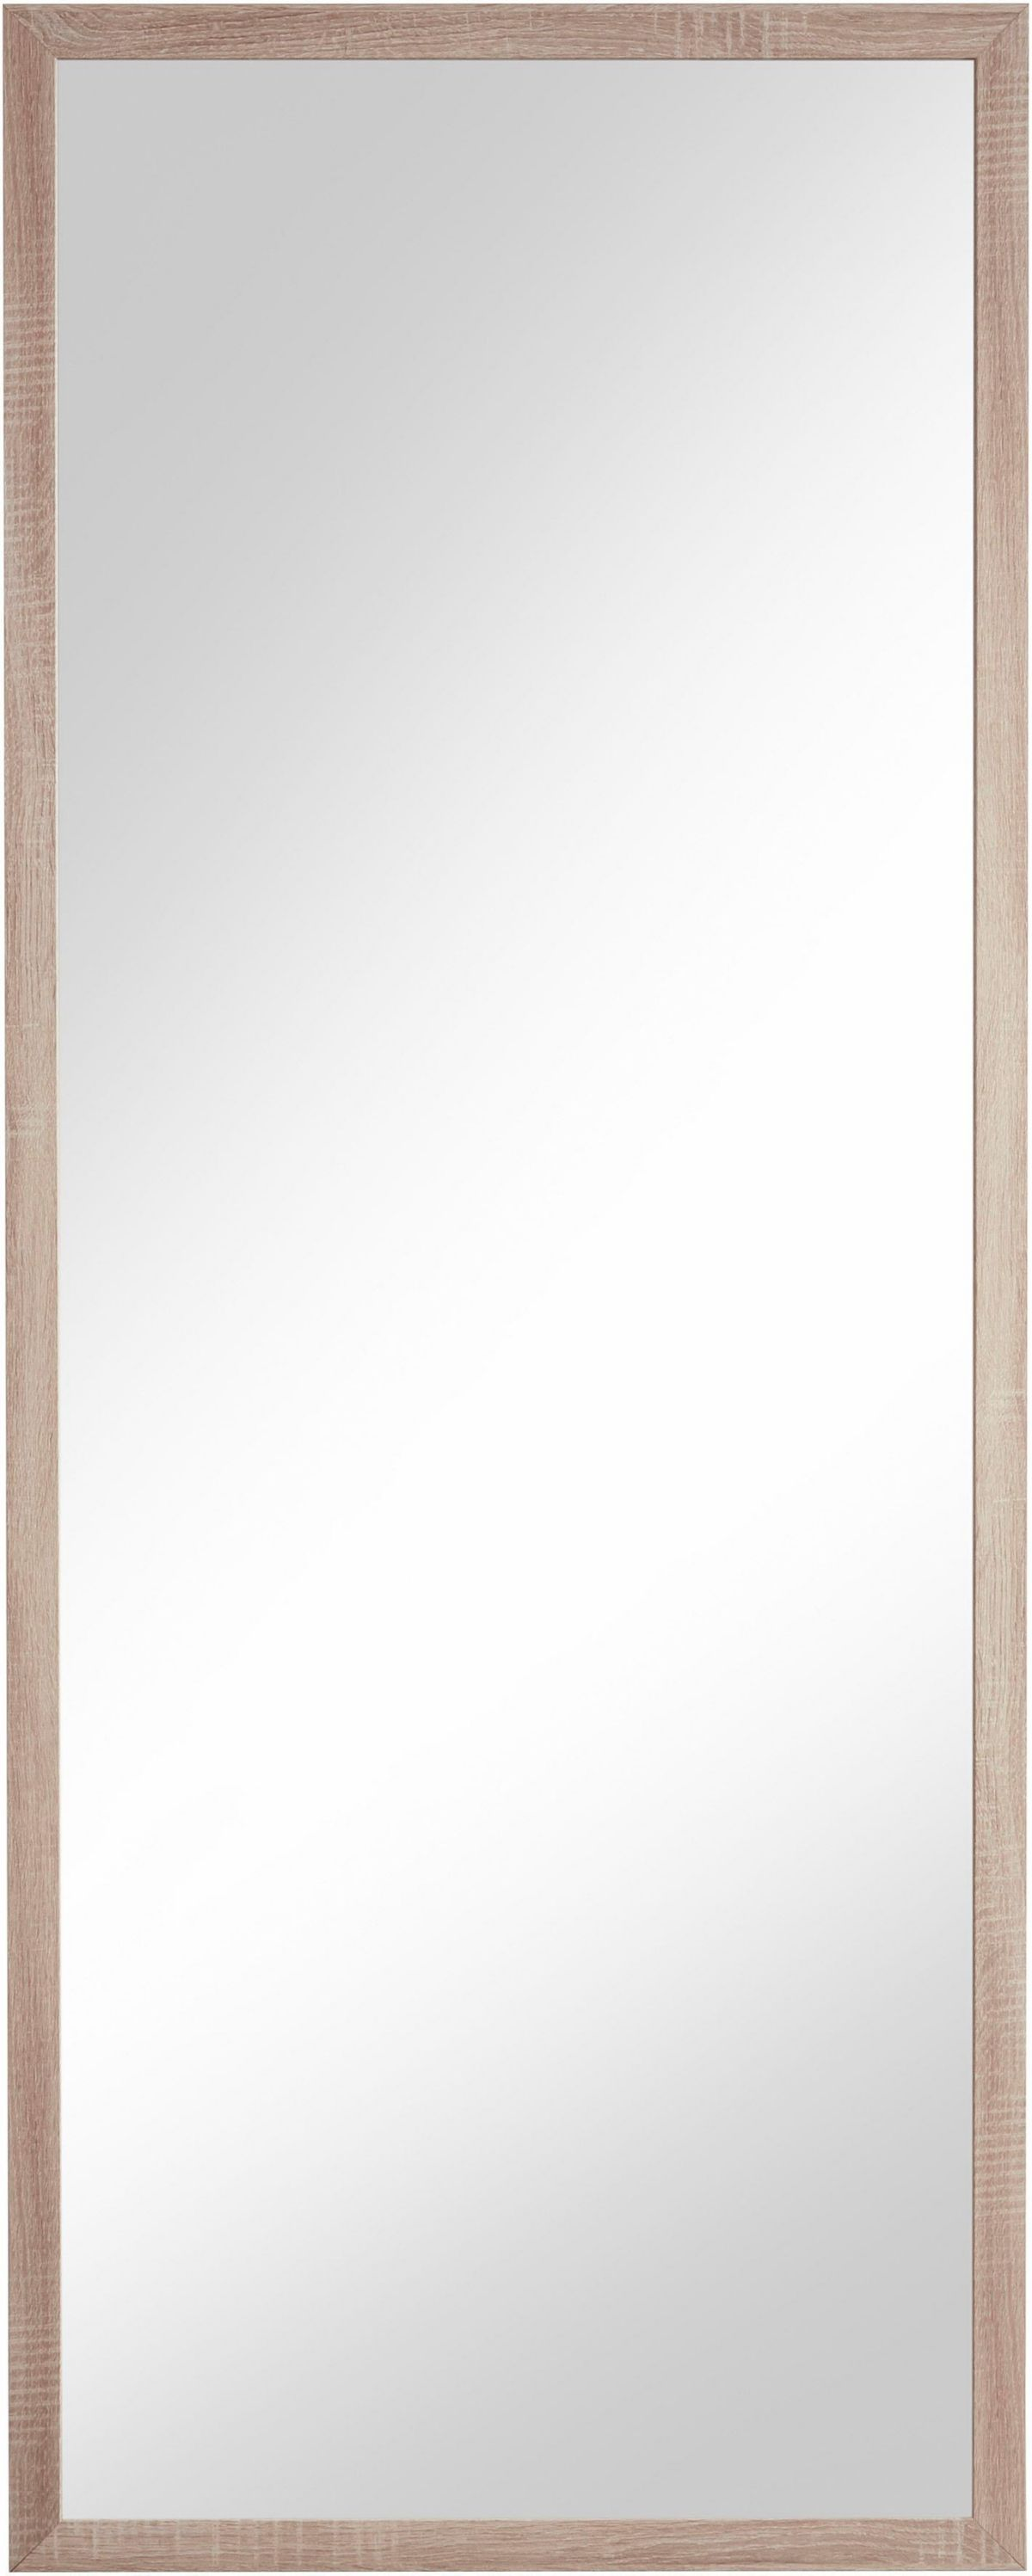 Home affaire Gerahmter Spiegel »Kathi«, 66/166 cm